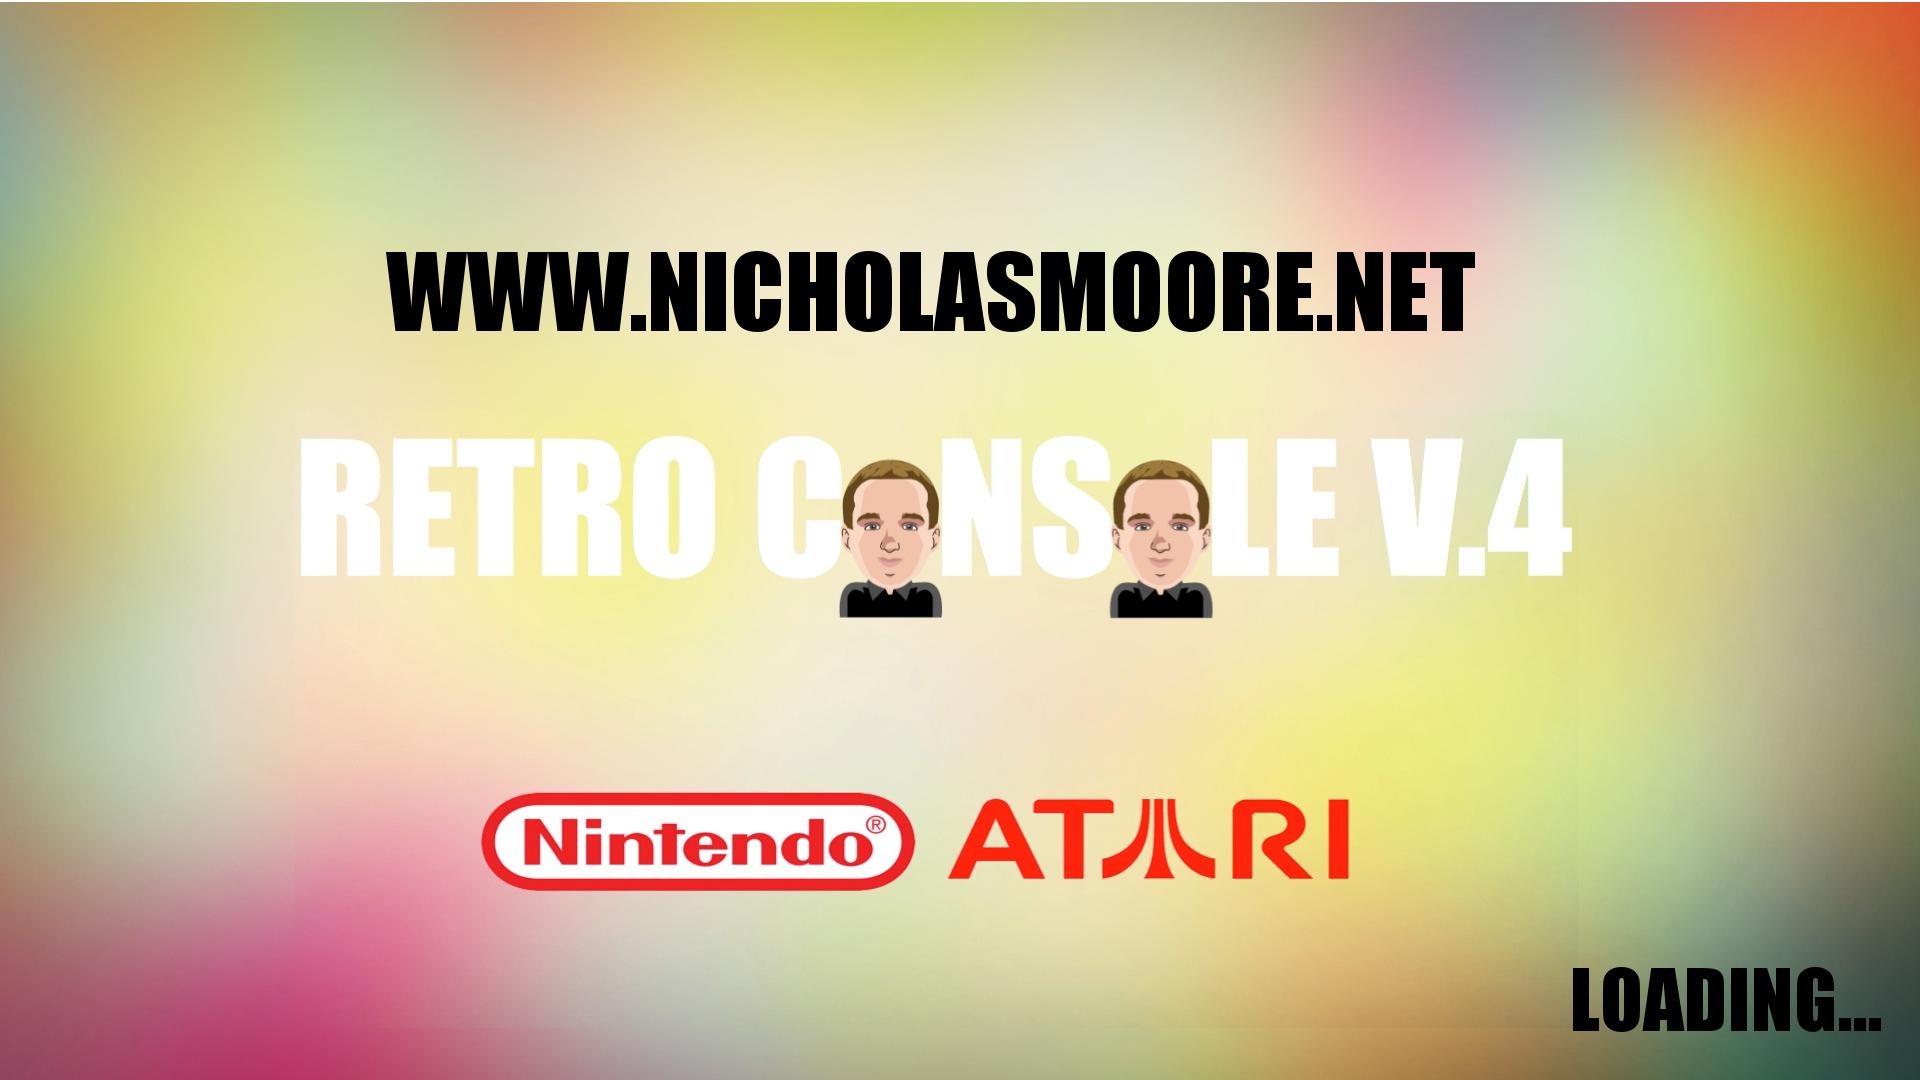 Preview for video splash